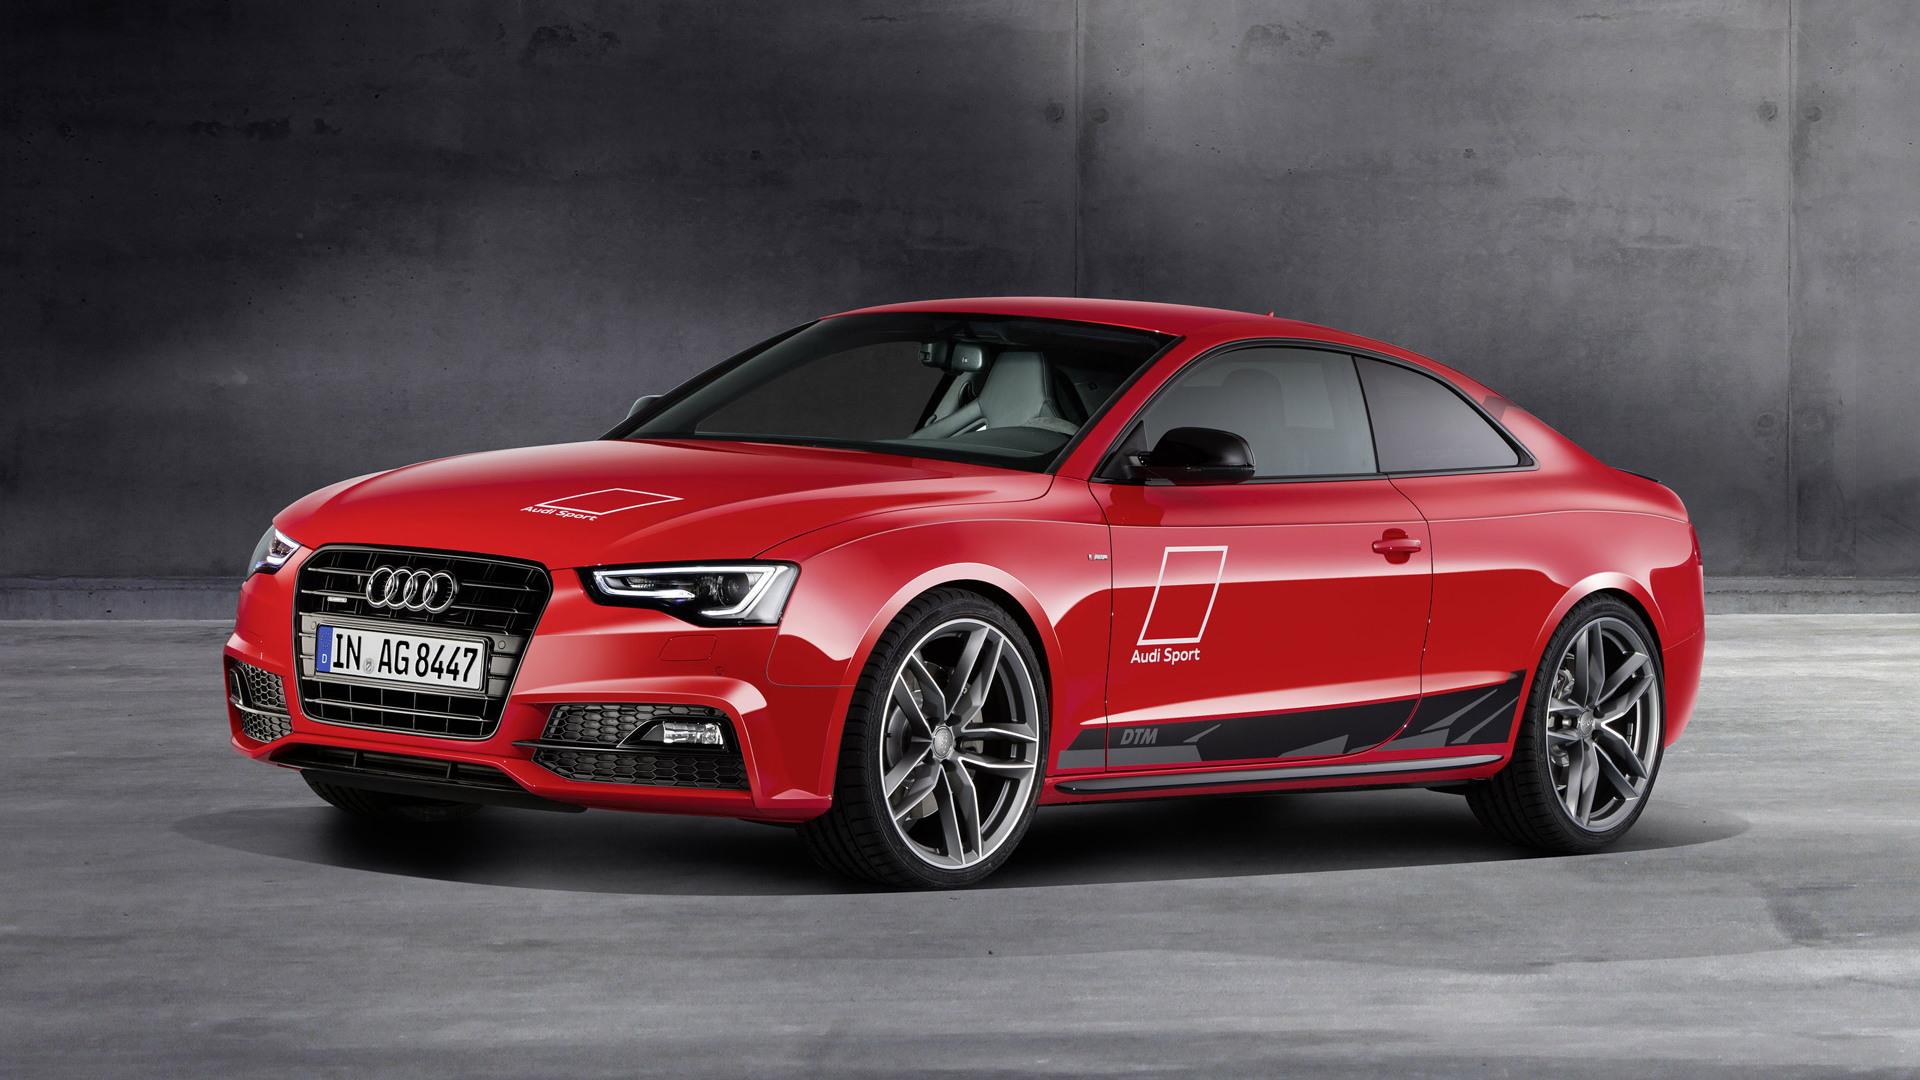 2015 Audi A5 DTM Selection